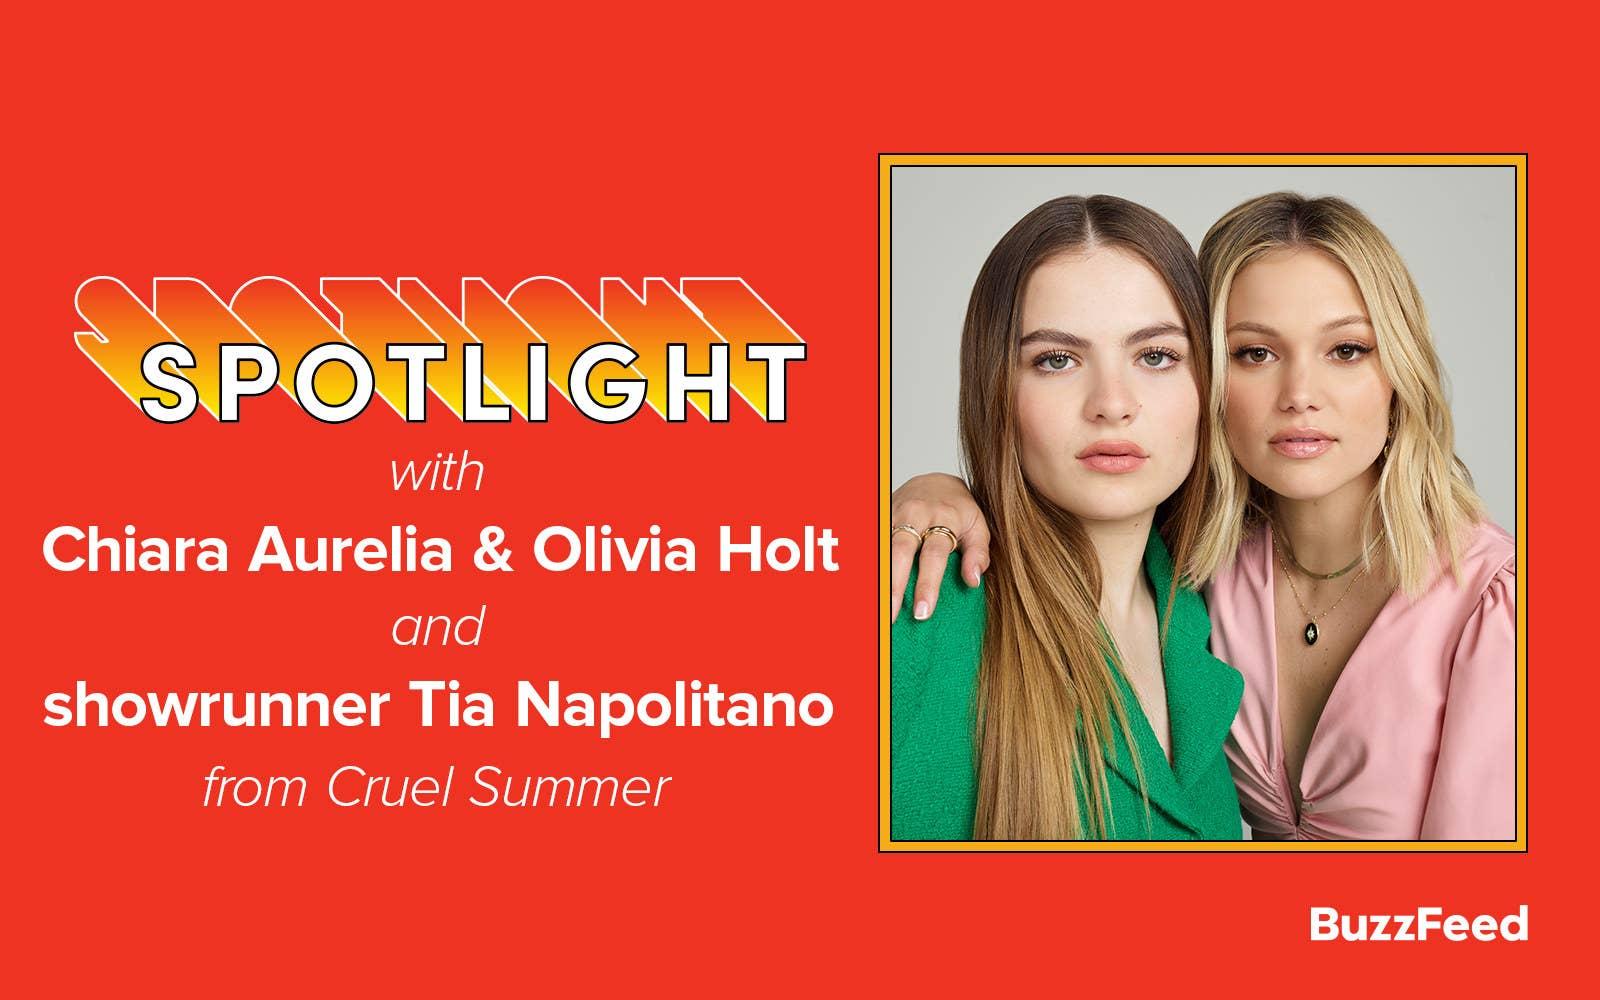 "A header reading: ""Spotlight with Chiara Aurelia & Olivia Holt and showrunner Tia Napolitano from Cruel Summer"""